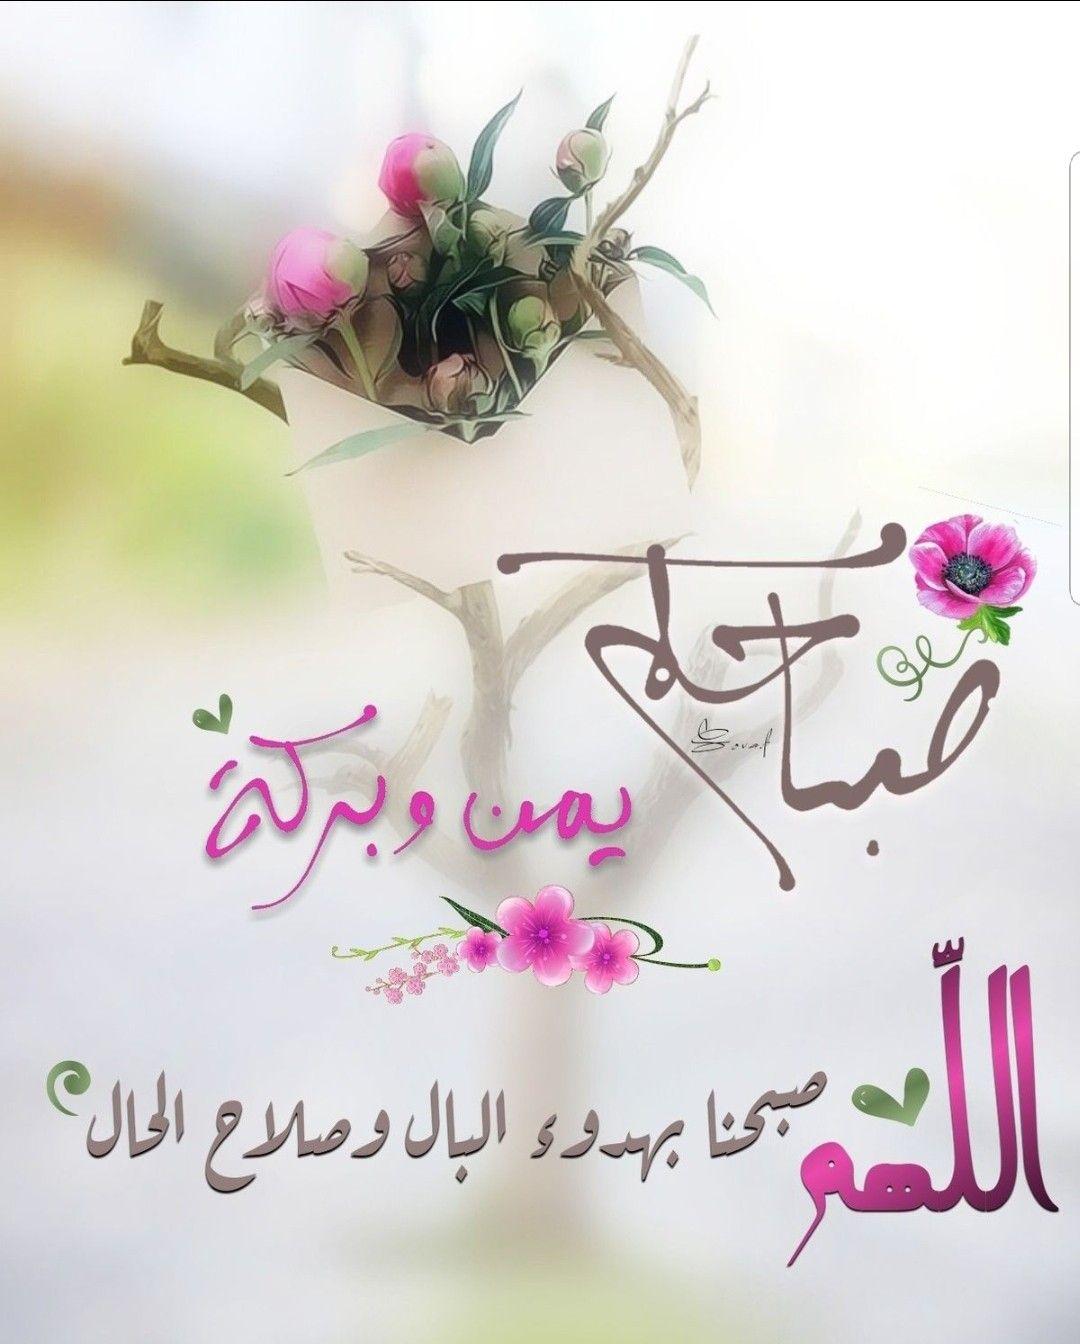 Pin By Yosef Ez On صباح الخير مساء الخير جمعتكم طيبه Good Morning Arabic Morning Greeting Morning Images